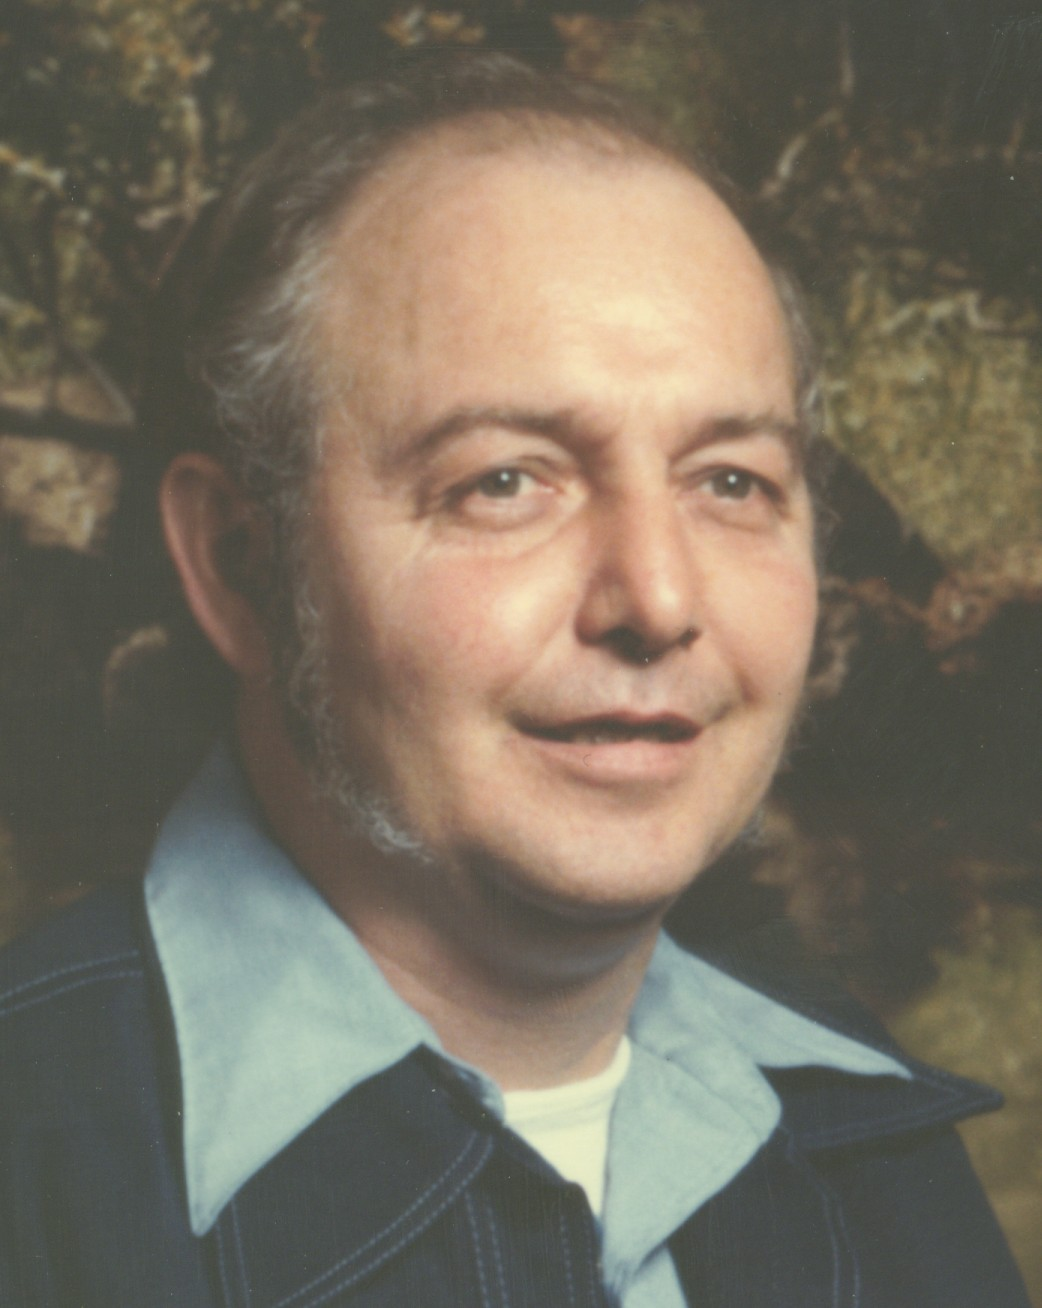 Orland Carl Murphy